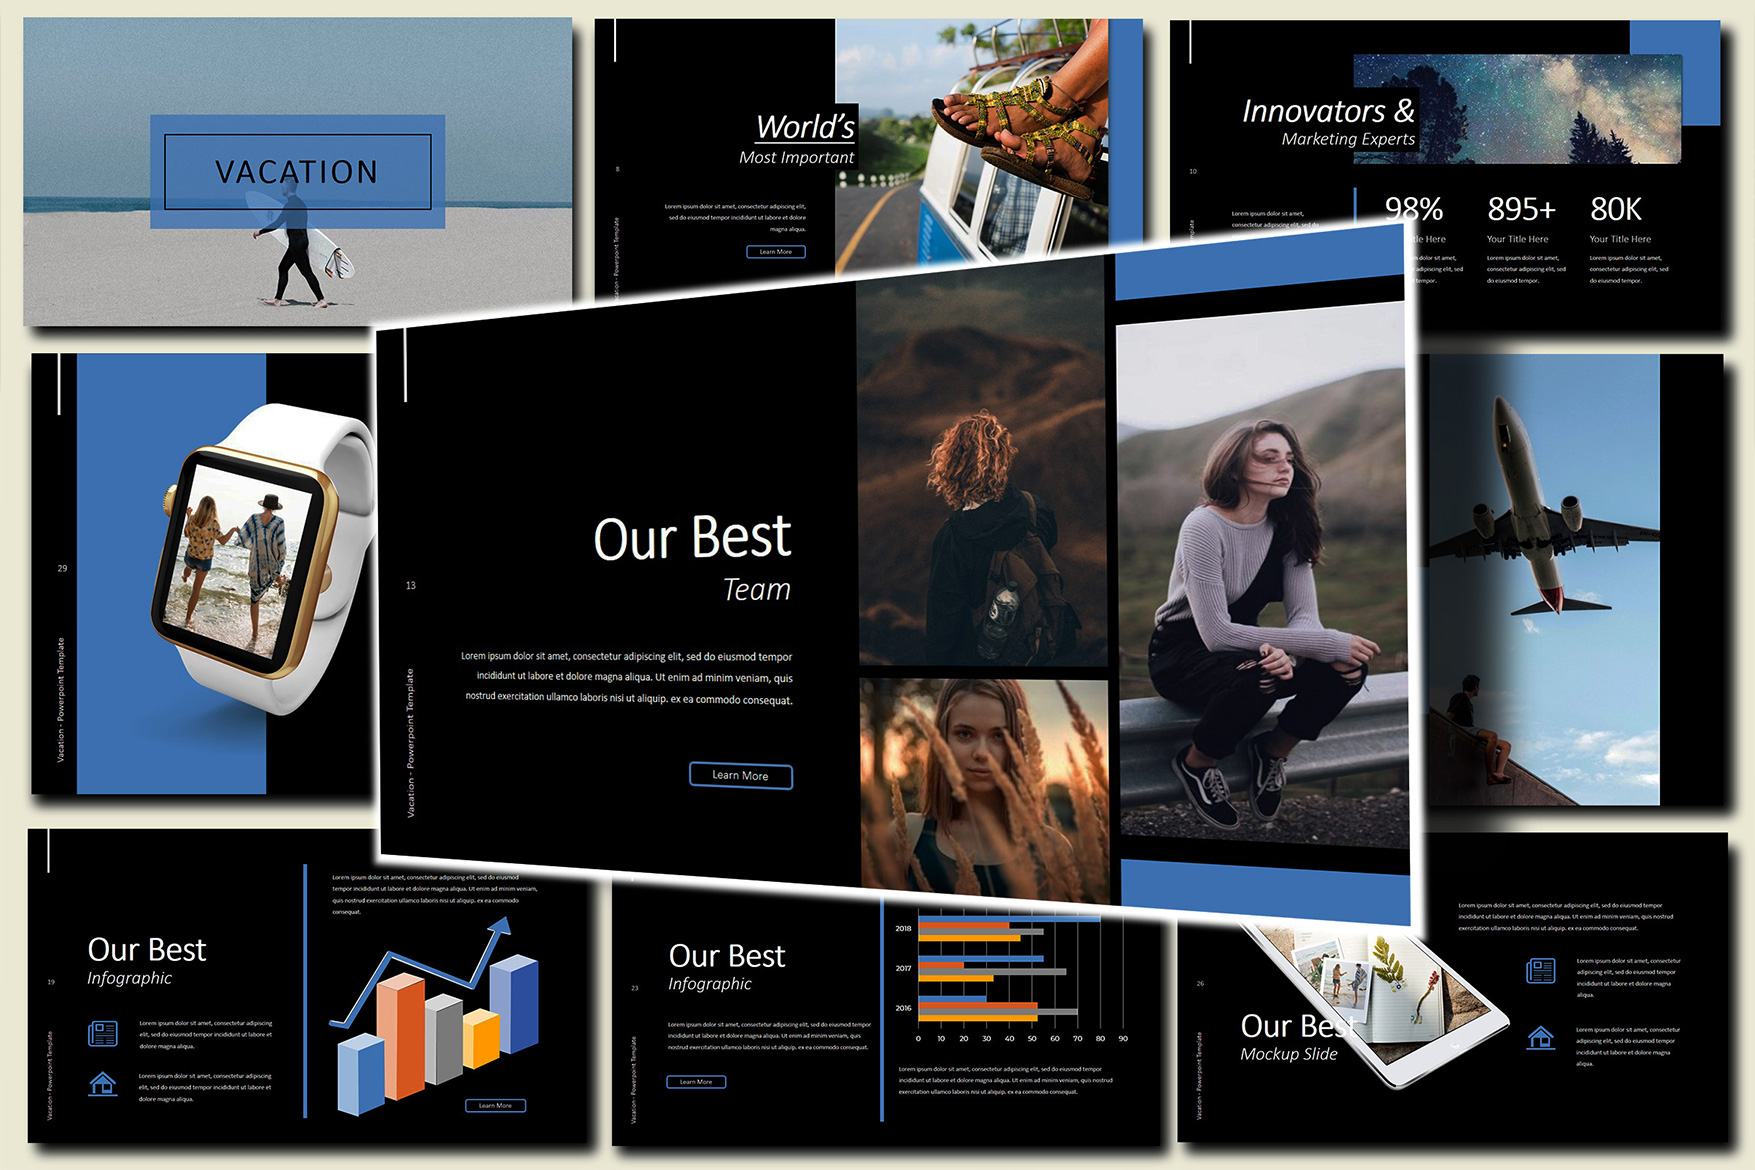 Vacation Lookbook Dark Google Slides Presentation example image 1